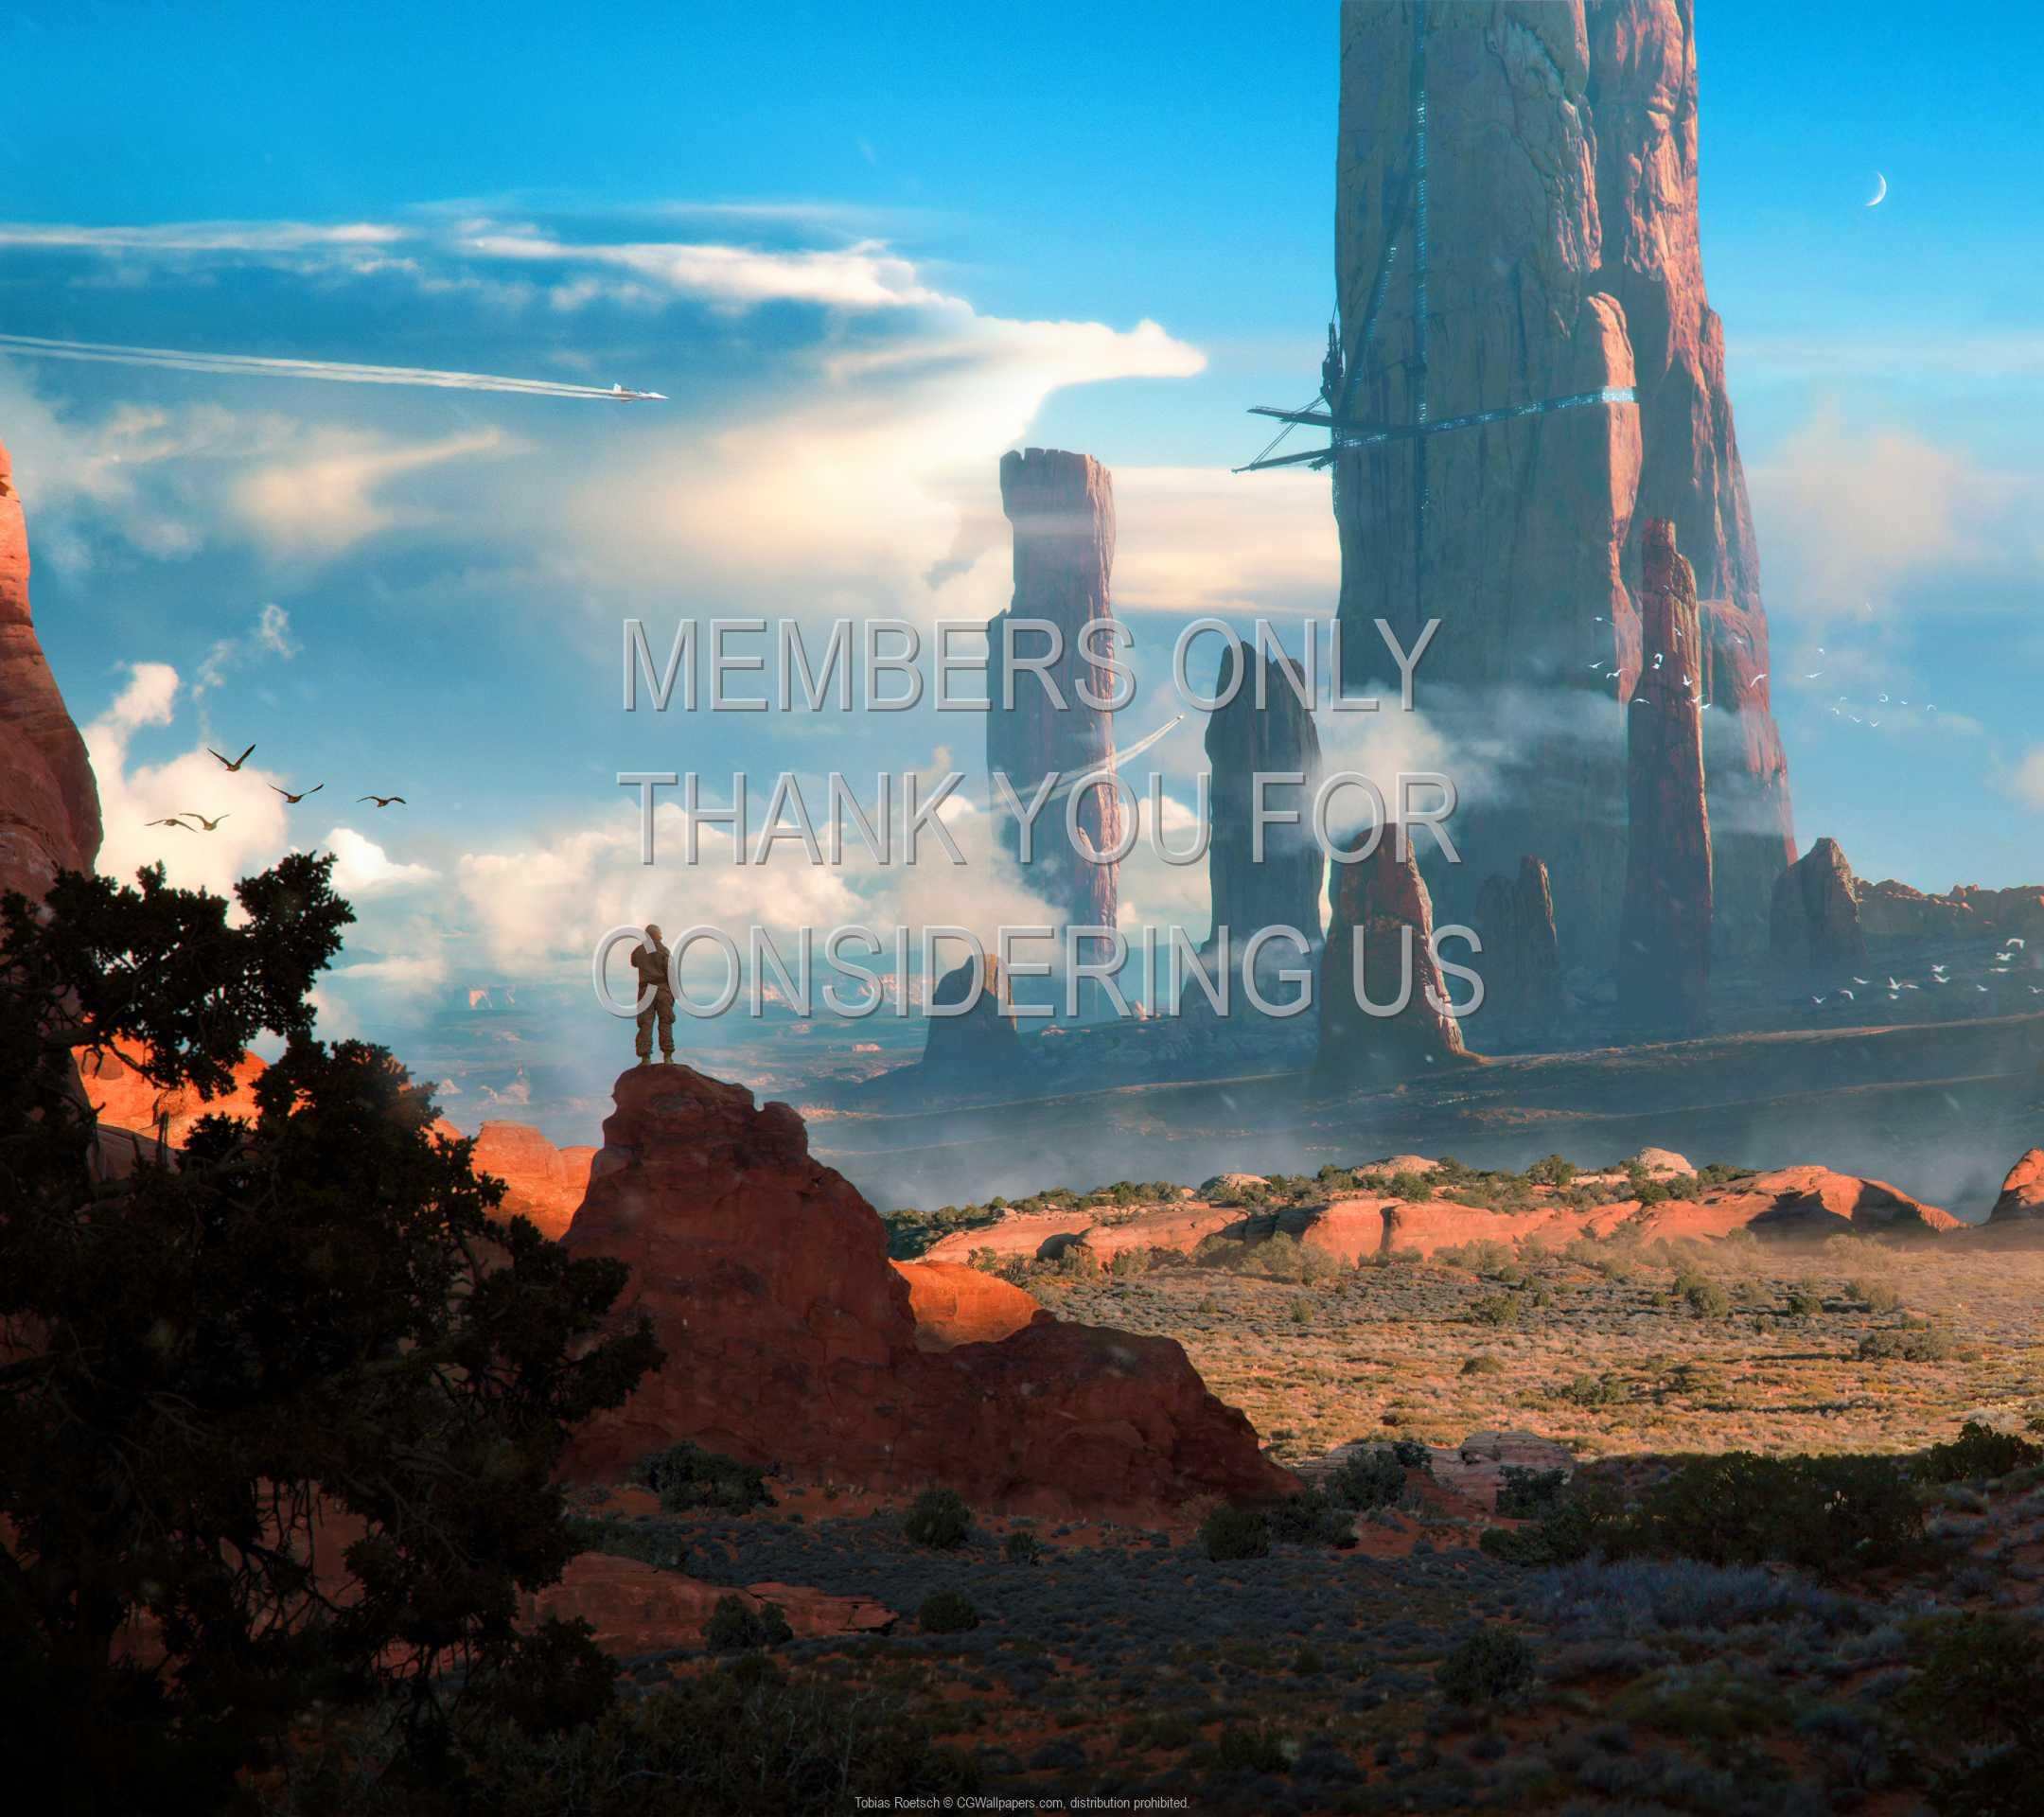 Tobias Roetsch 1080p Horizontal Mobile wallpaper or background 18